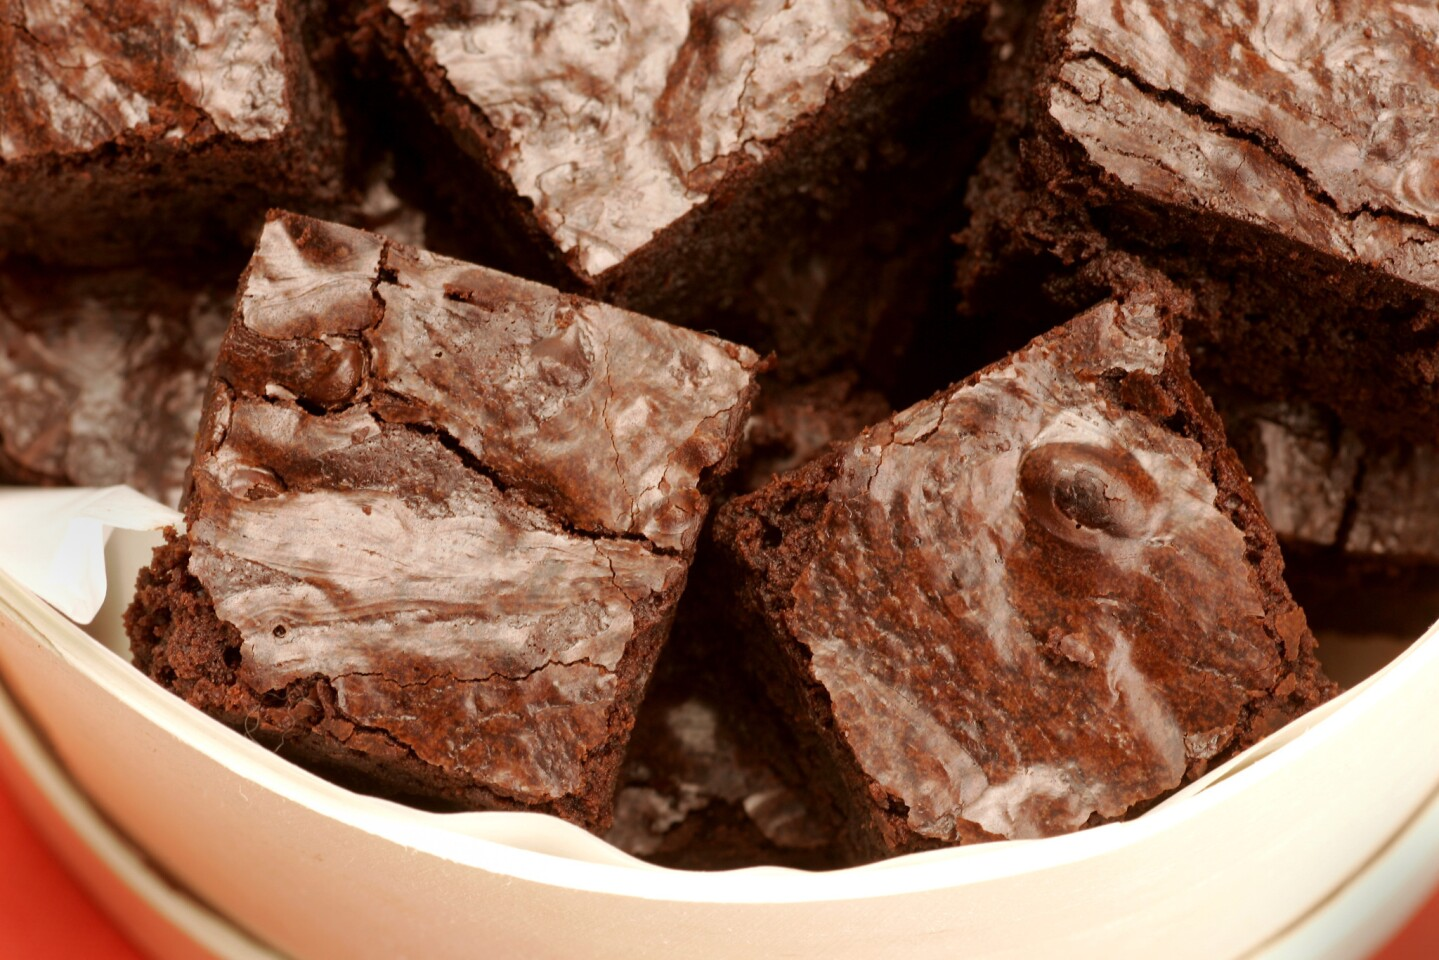 Midnight chocolate brownies